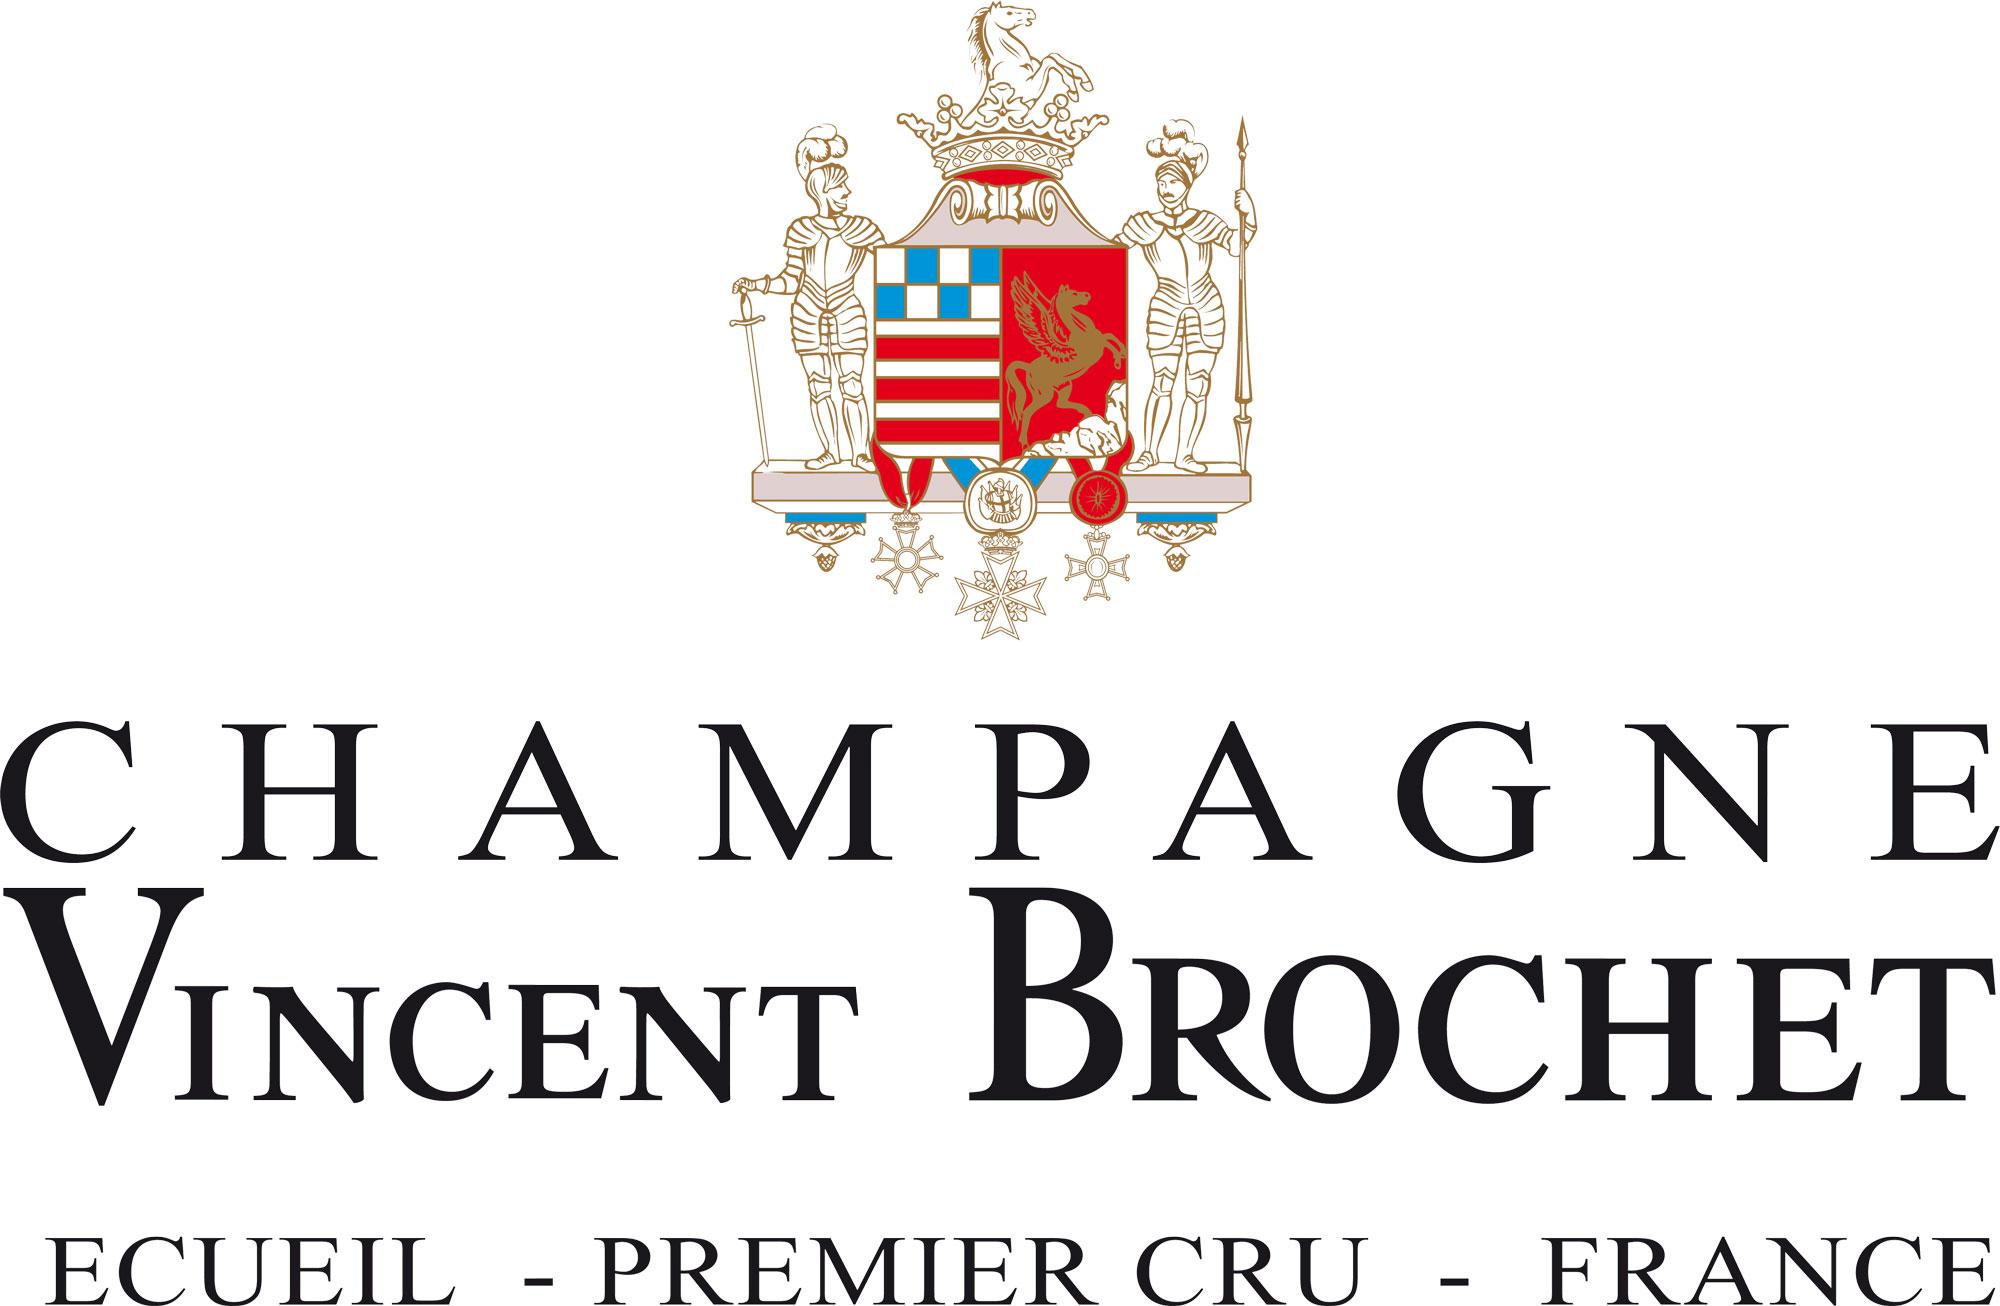 Vincent Brochet Champagne